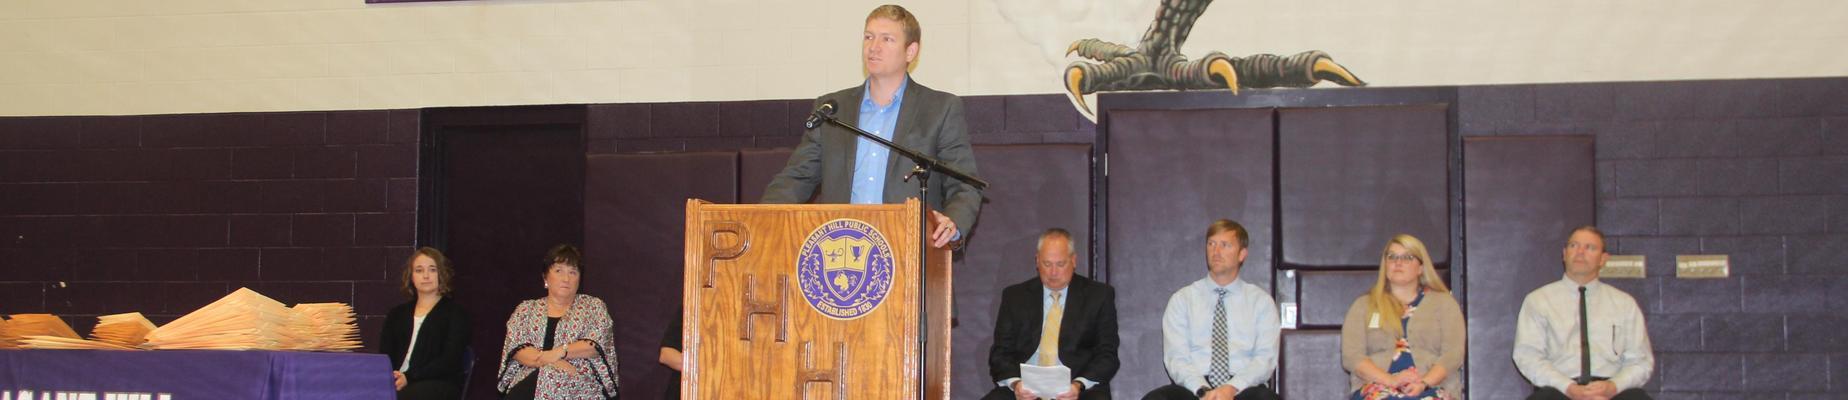 Jesse Hartter, PHHS Graduate speaks at Academic Letter Assembly